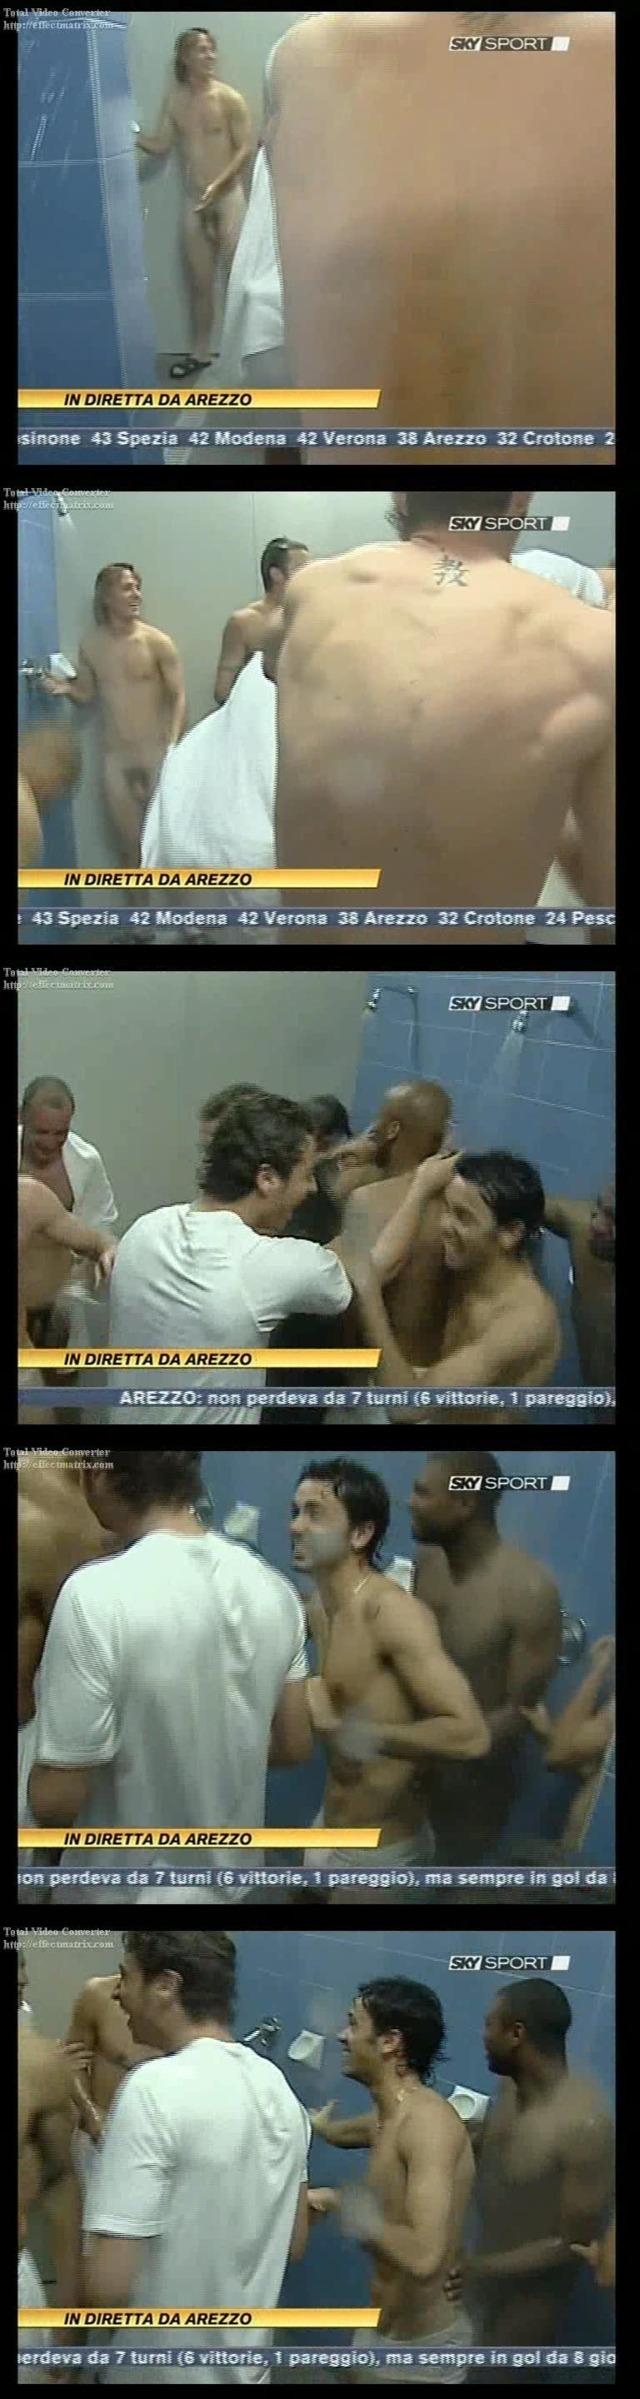 italian footballers caught naked in shower on tv